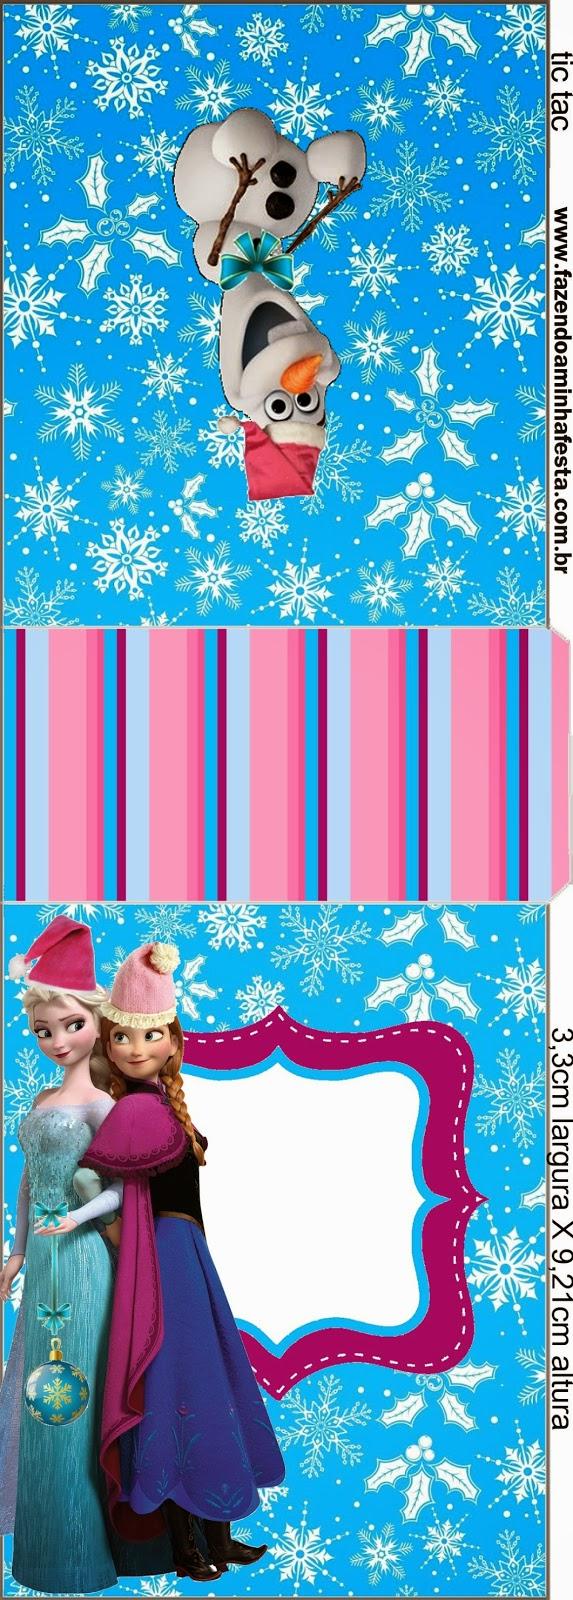 Etiquetas para Tic Tac para imprimir gratis de Frozen para Navidad.